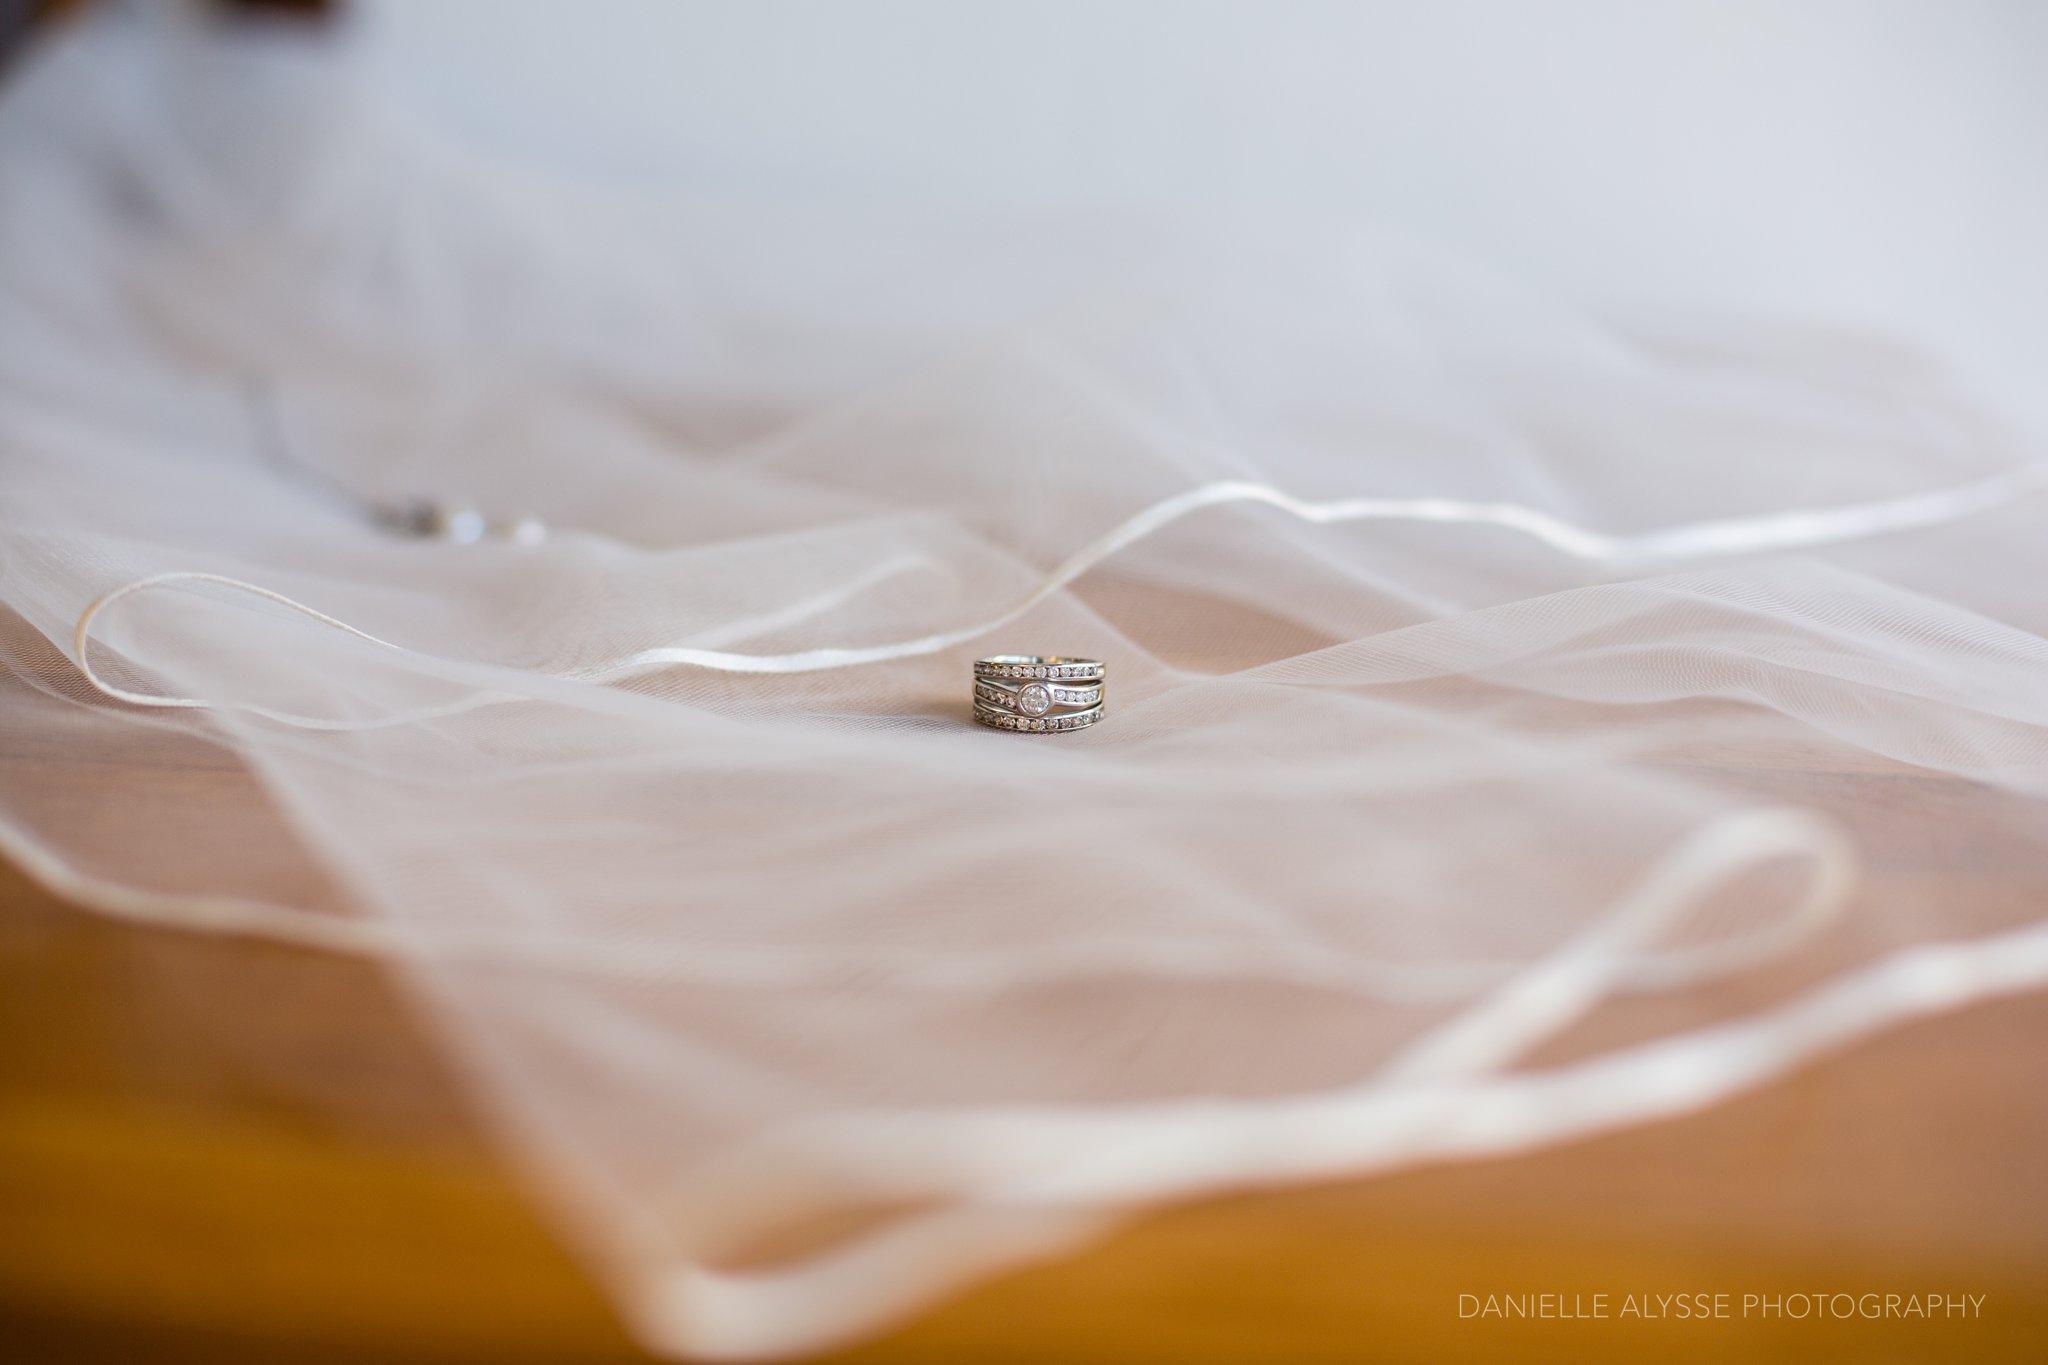 170429_blog_kimberly_ben_wedding_san_mateo_curiodyssey_danielle_alysse_photography_sacramento_photographer0004_WEB.jpg